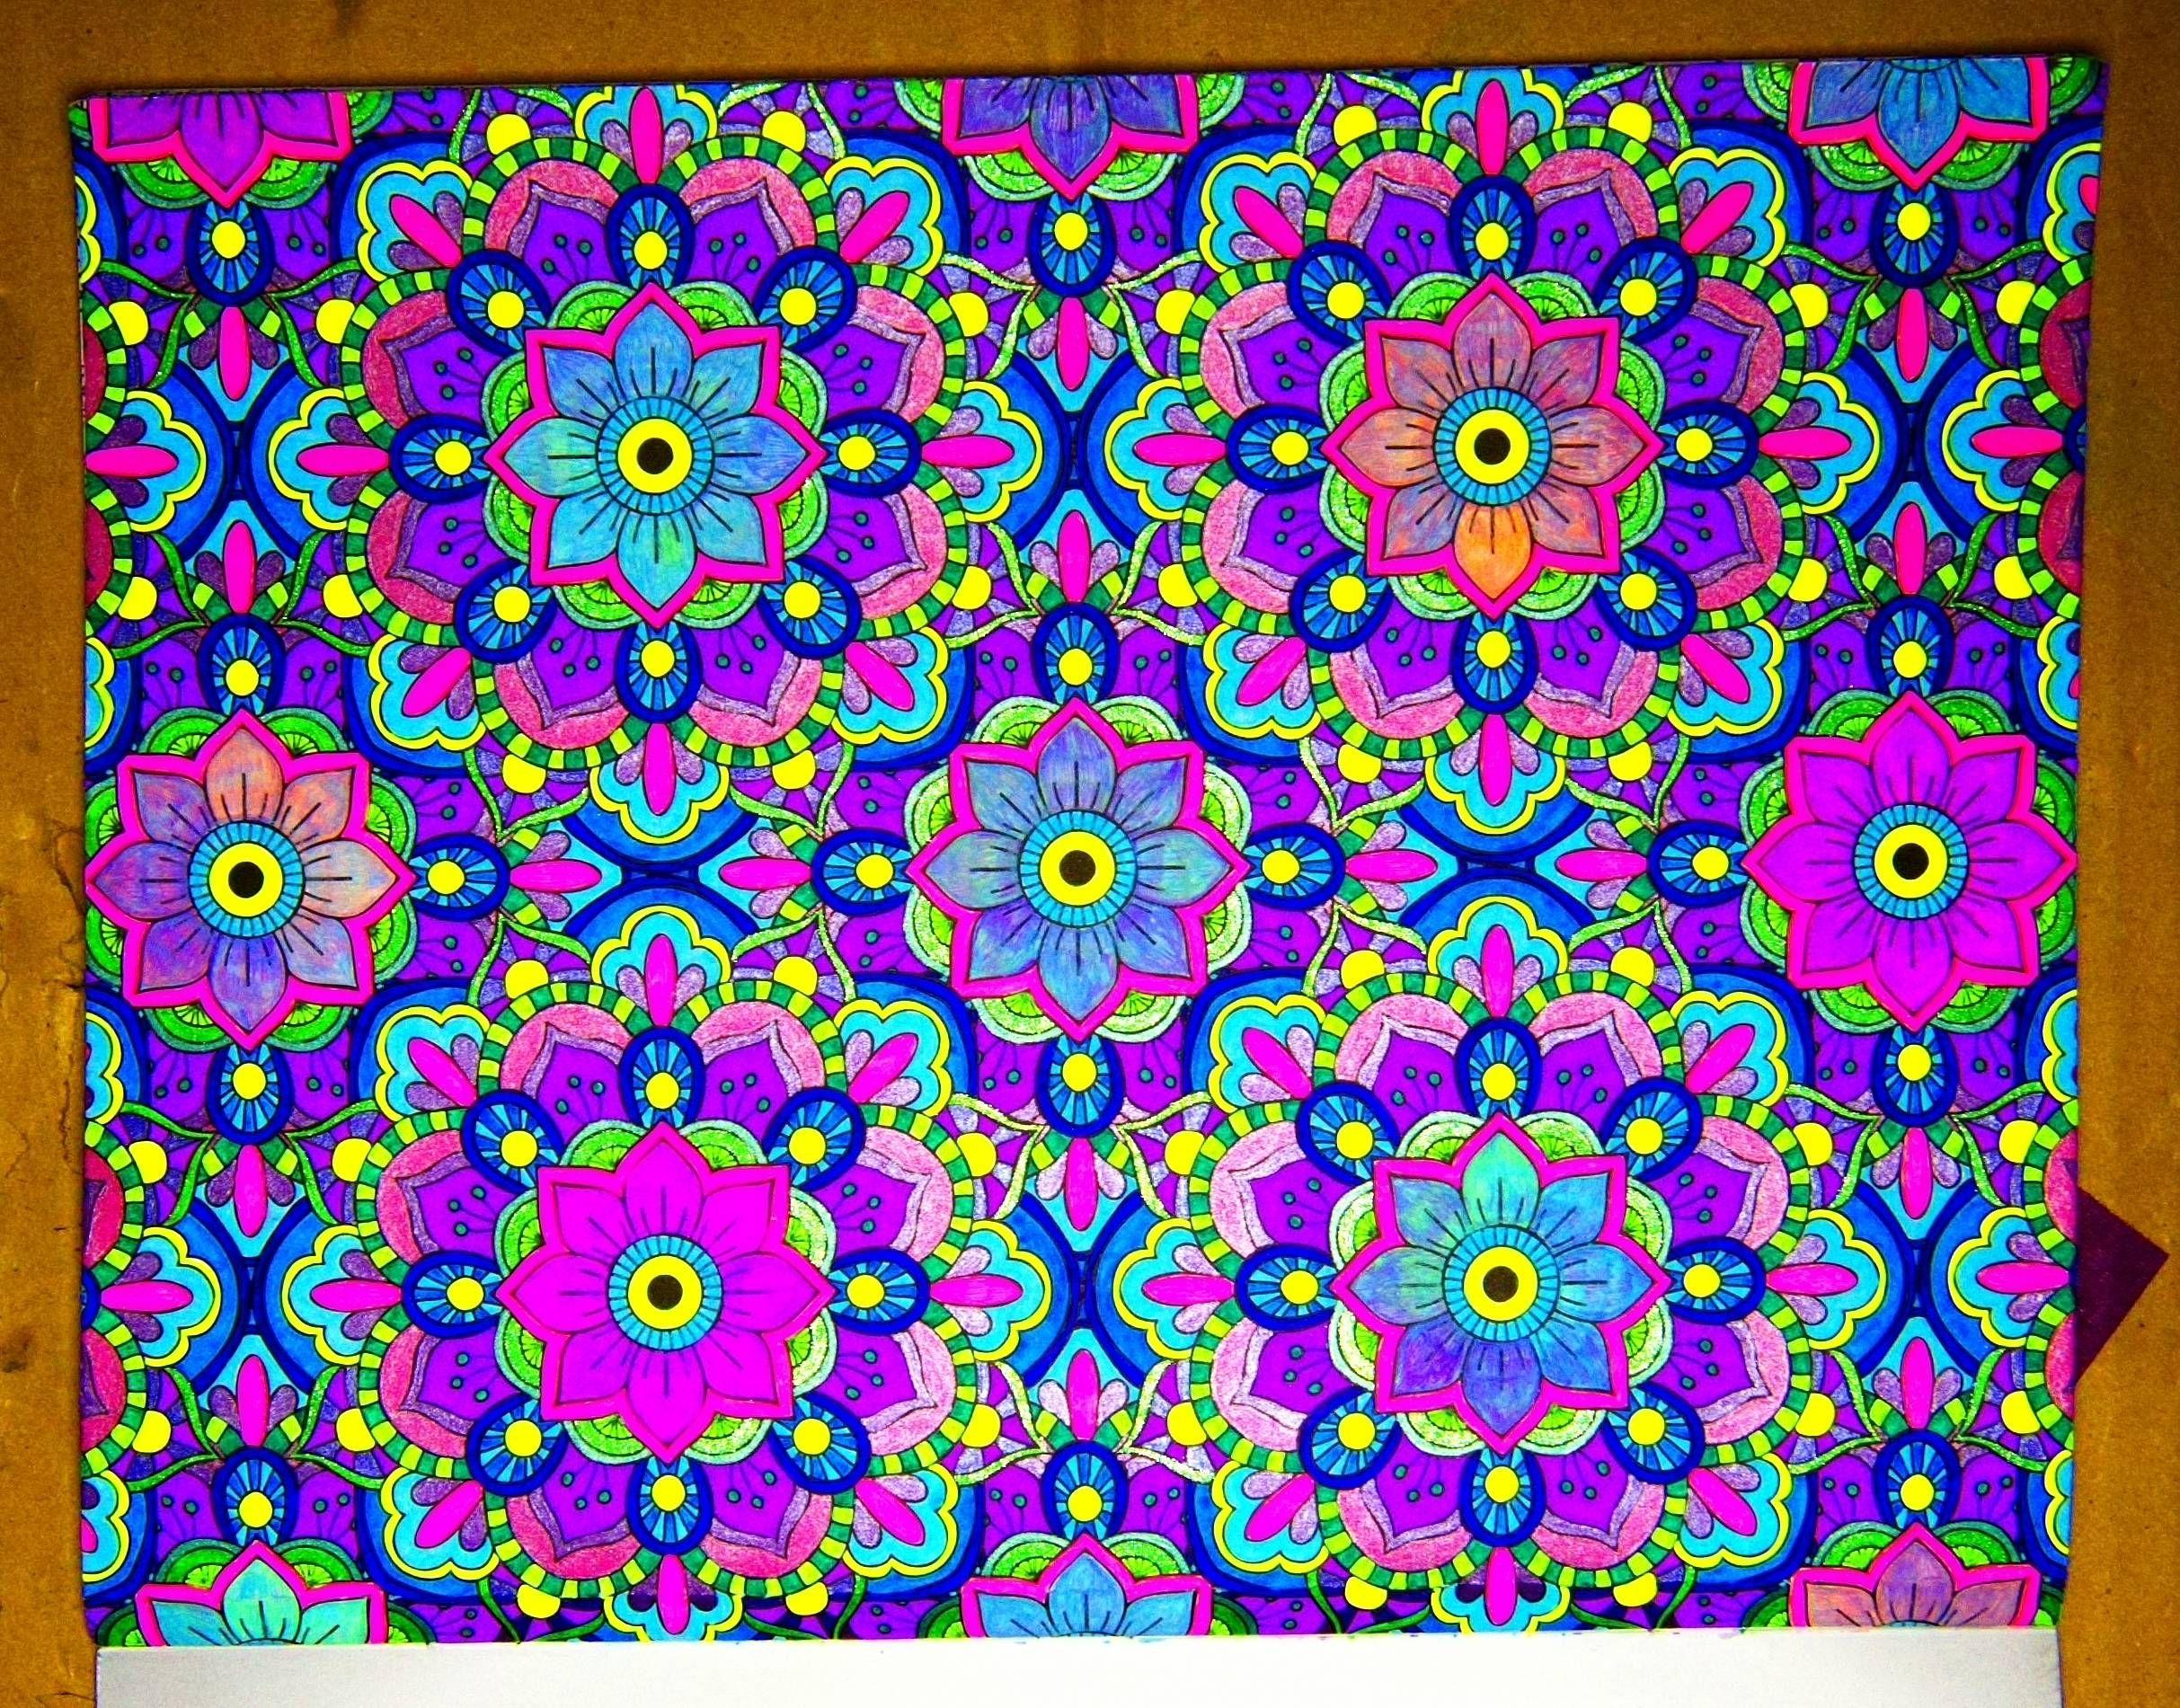 Color art mandala wonders - Mandala Wonders Color Art Page 1